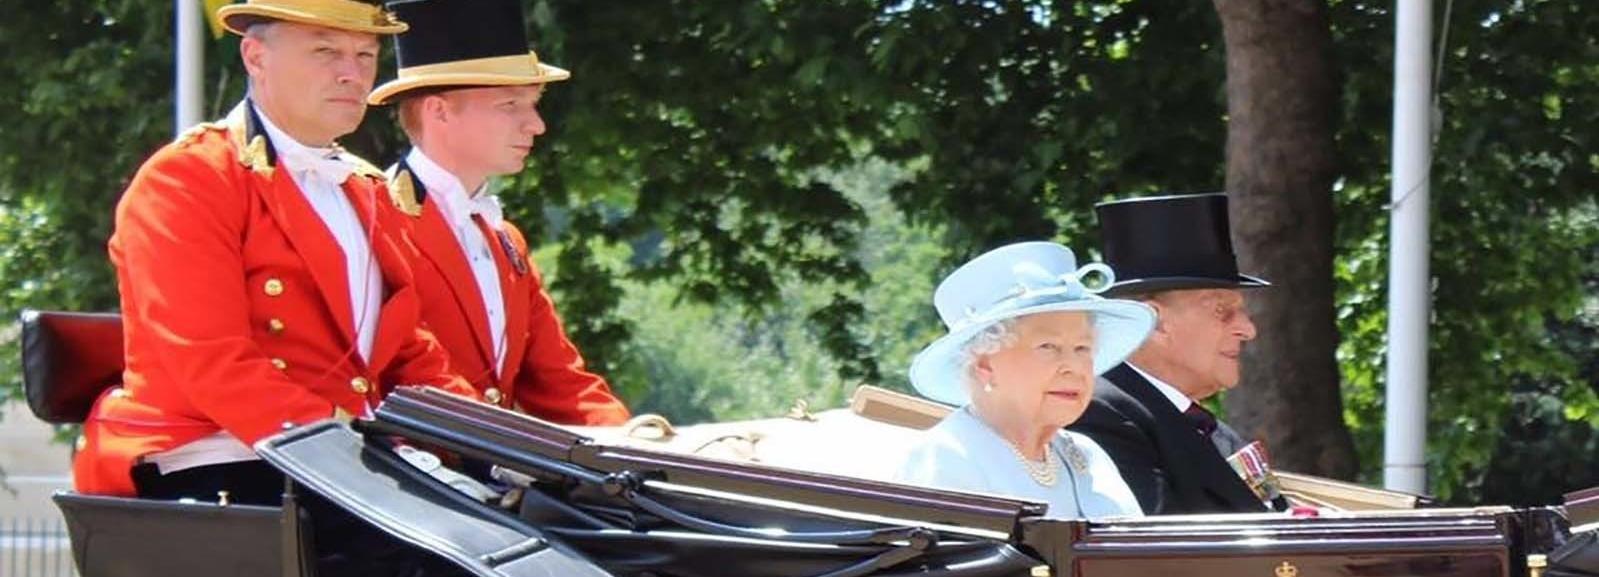 Royal London Taxi Tour